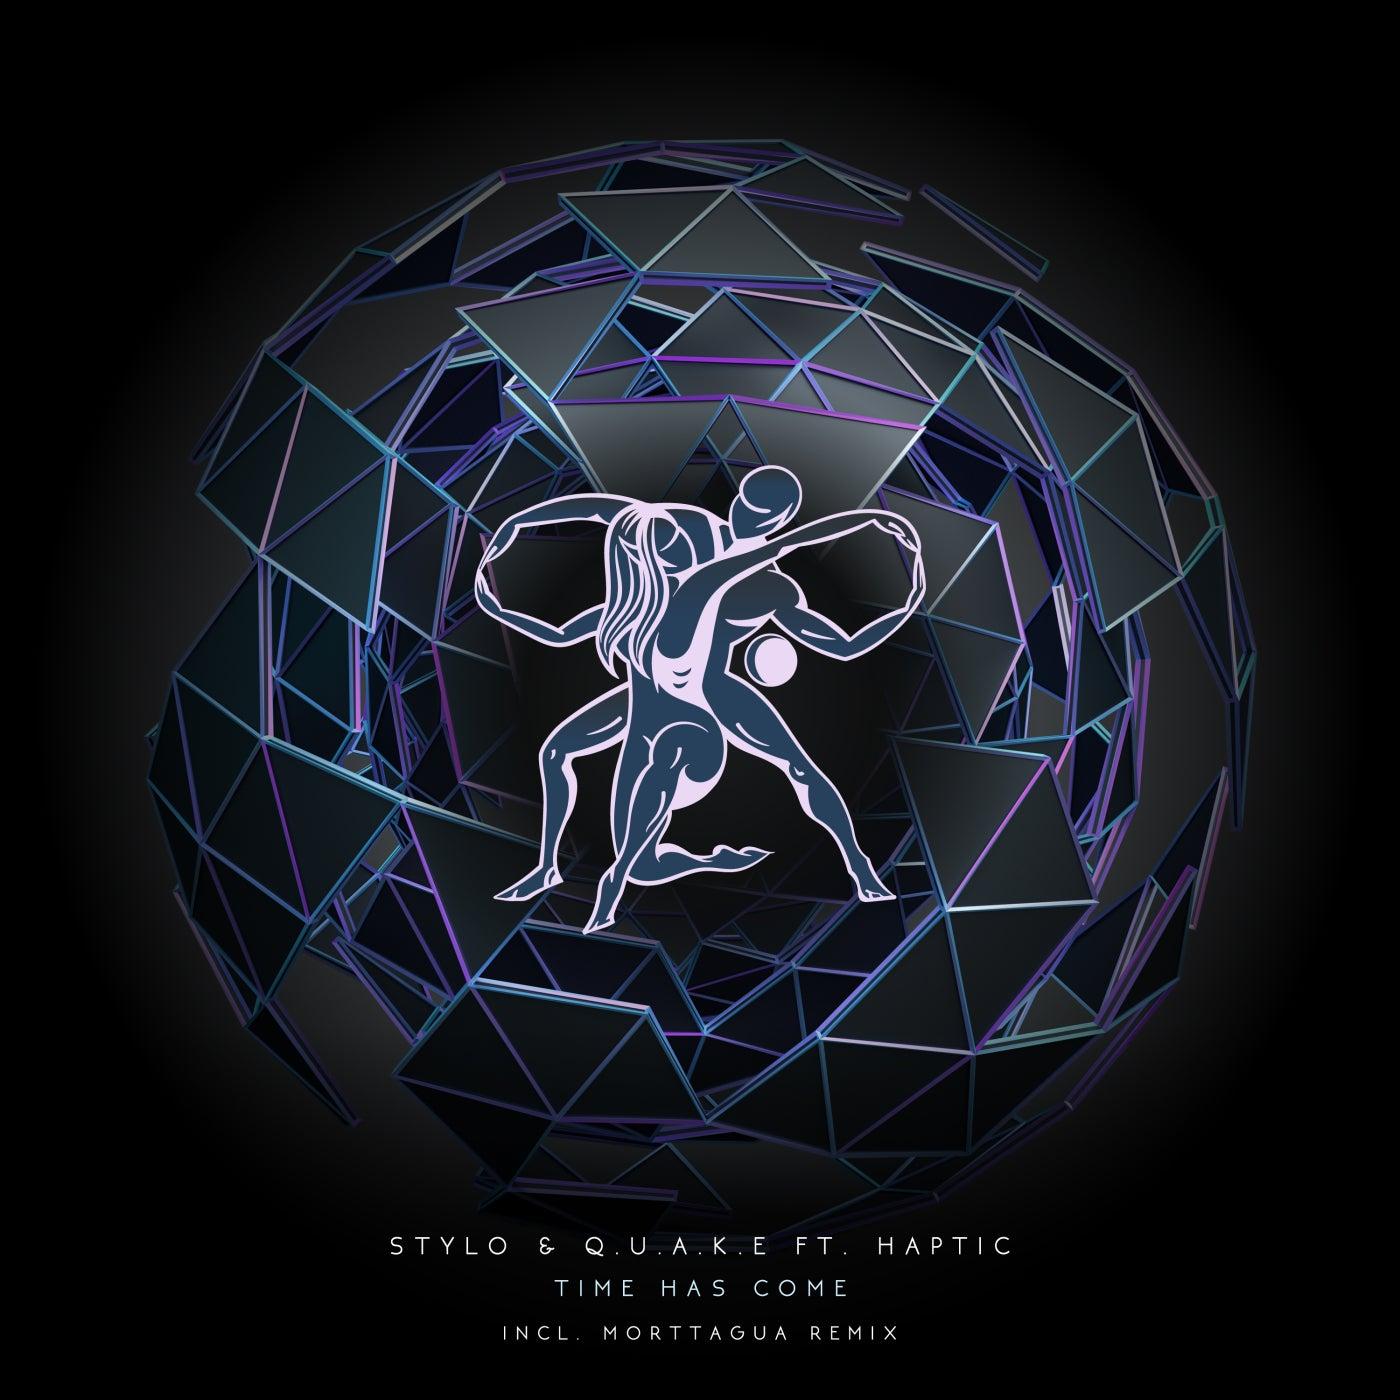 Time Has Come (Morttagua Remix)